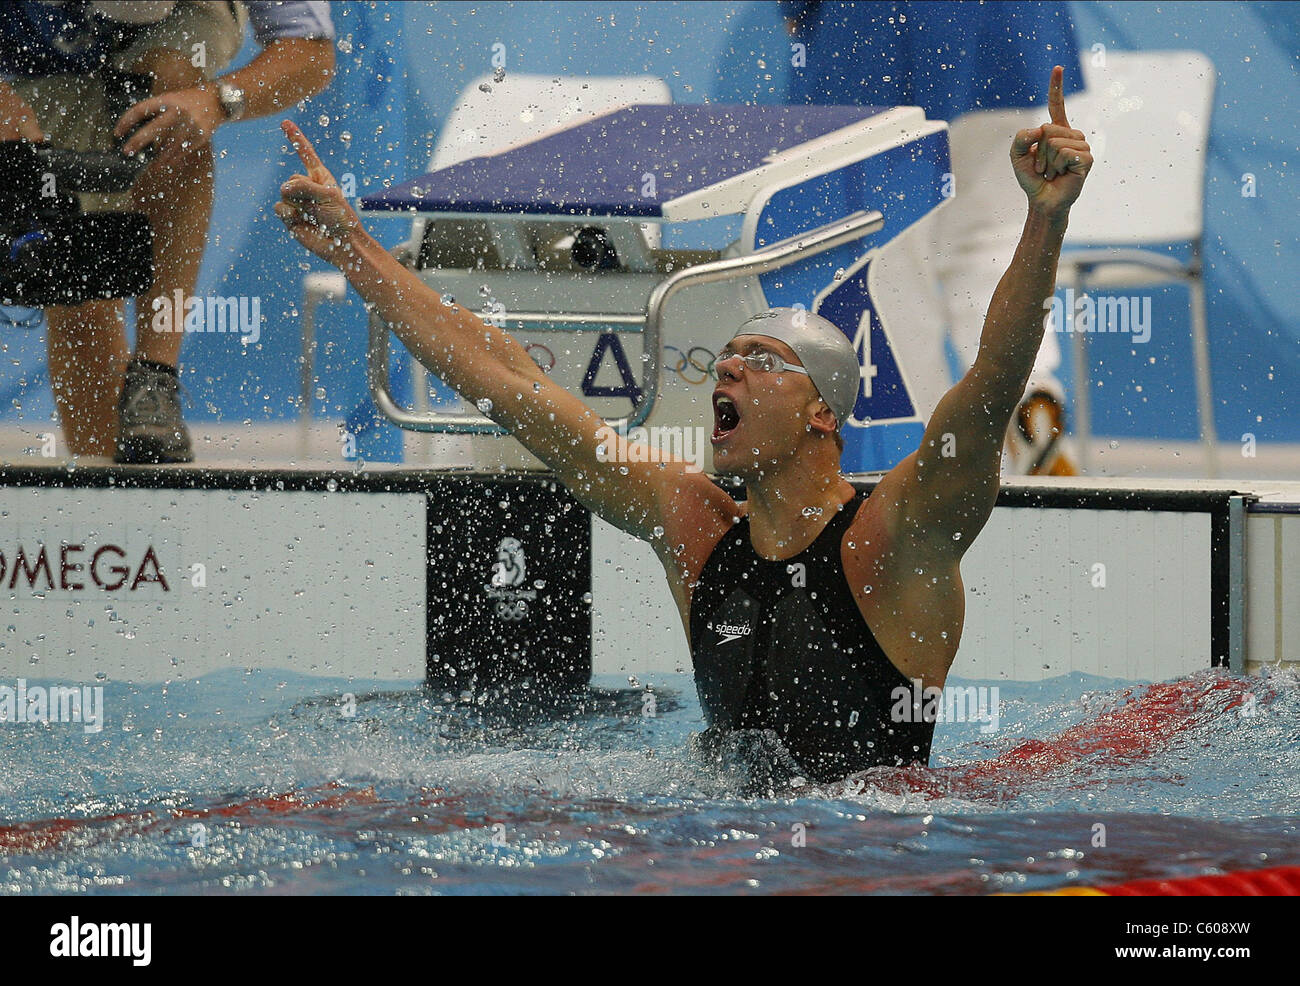 FILHO CESAR CIELO BRASILE lo stadio olimpico di Pechino CINA 16 Agosto 2008 Immagini Stock